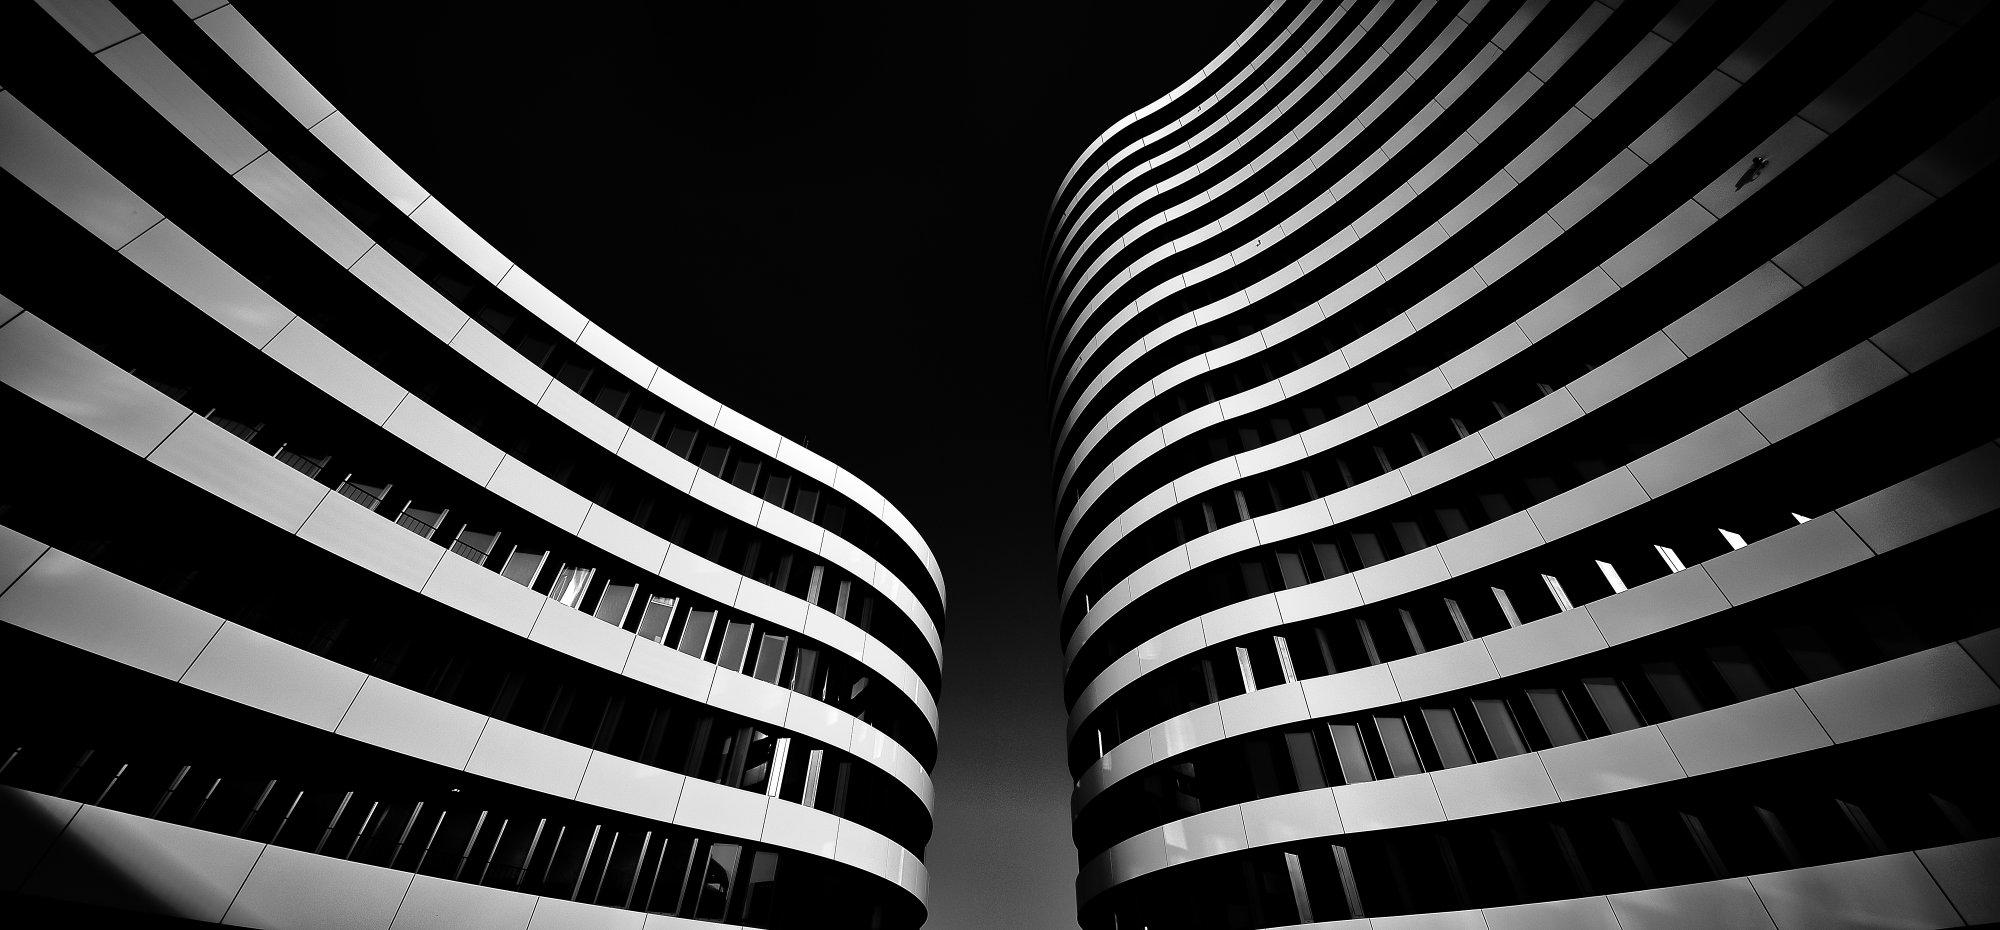 Wave Architecture